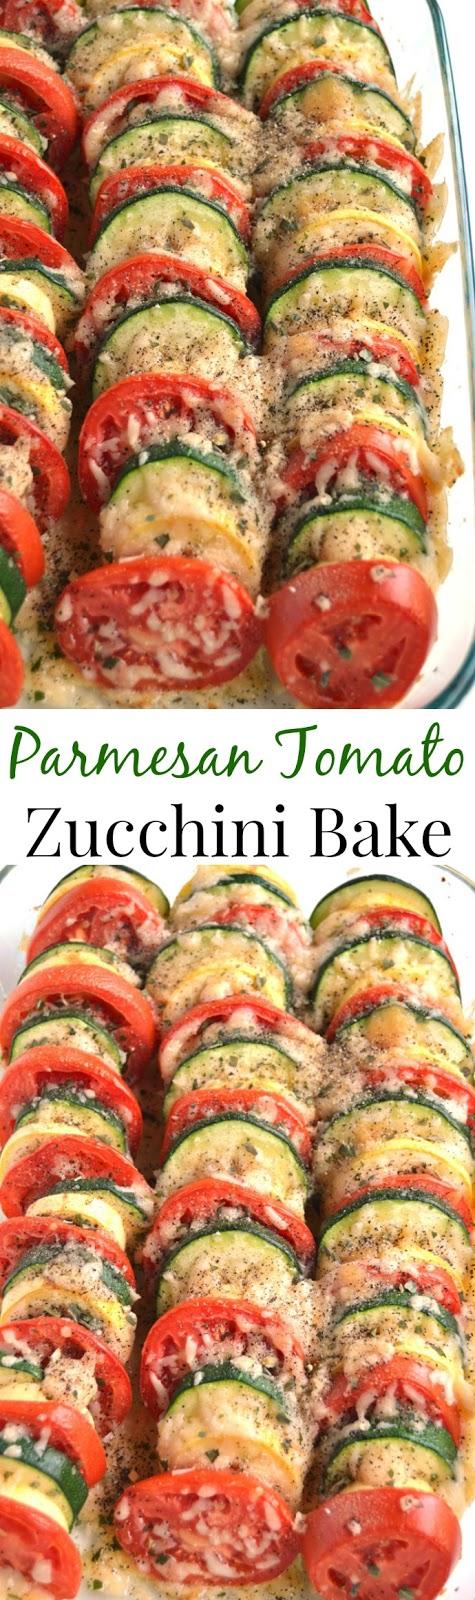 Parmesan Tomato Zucchini Bake